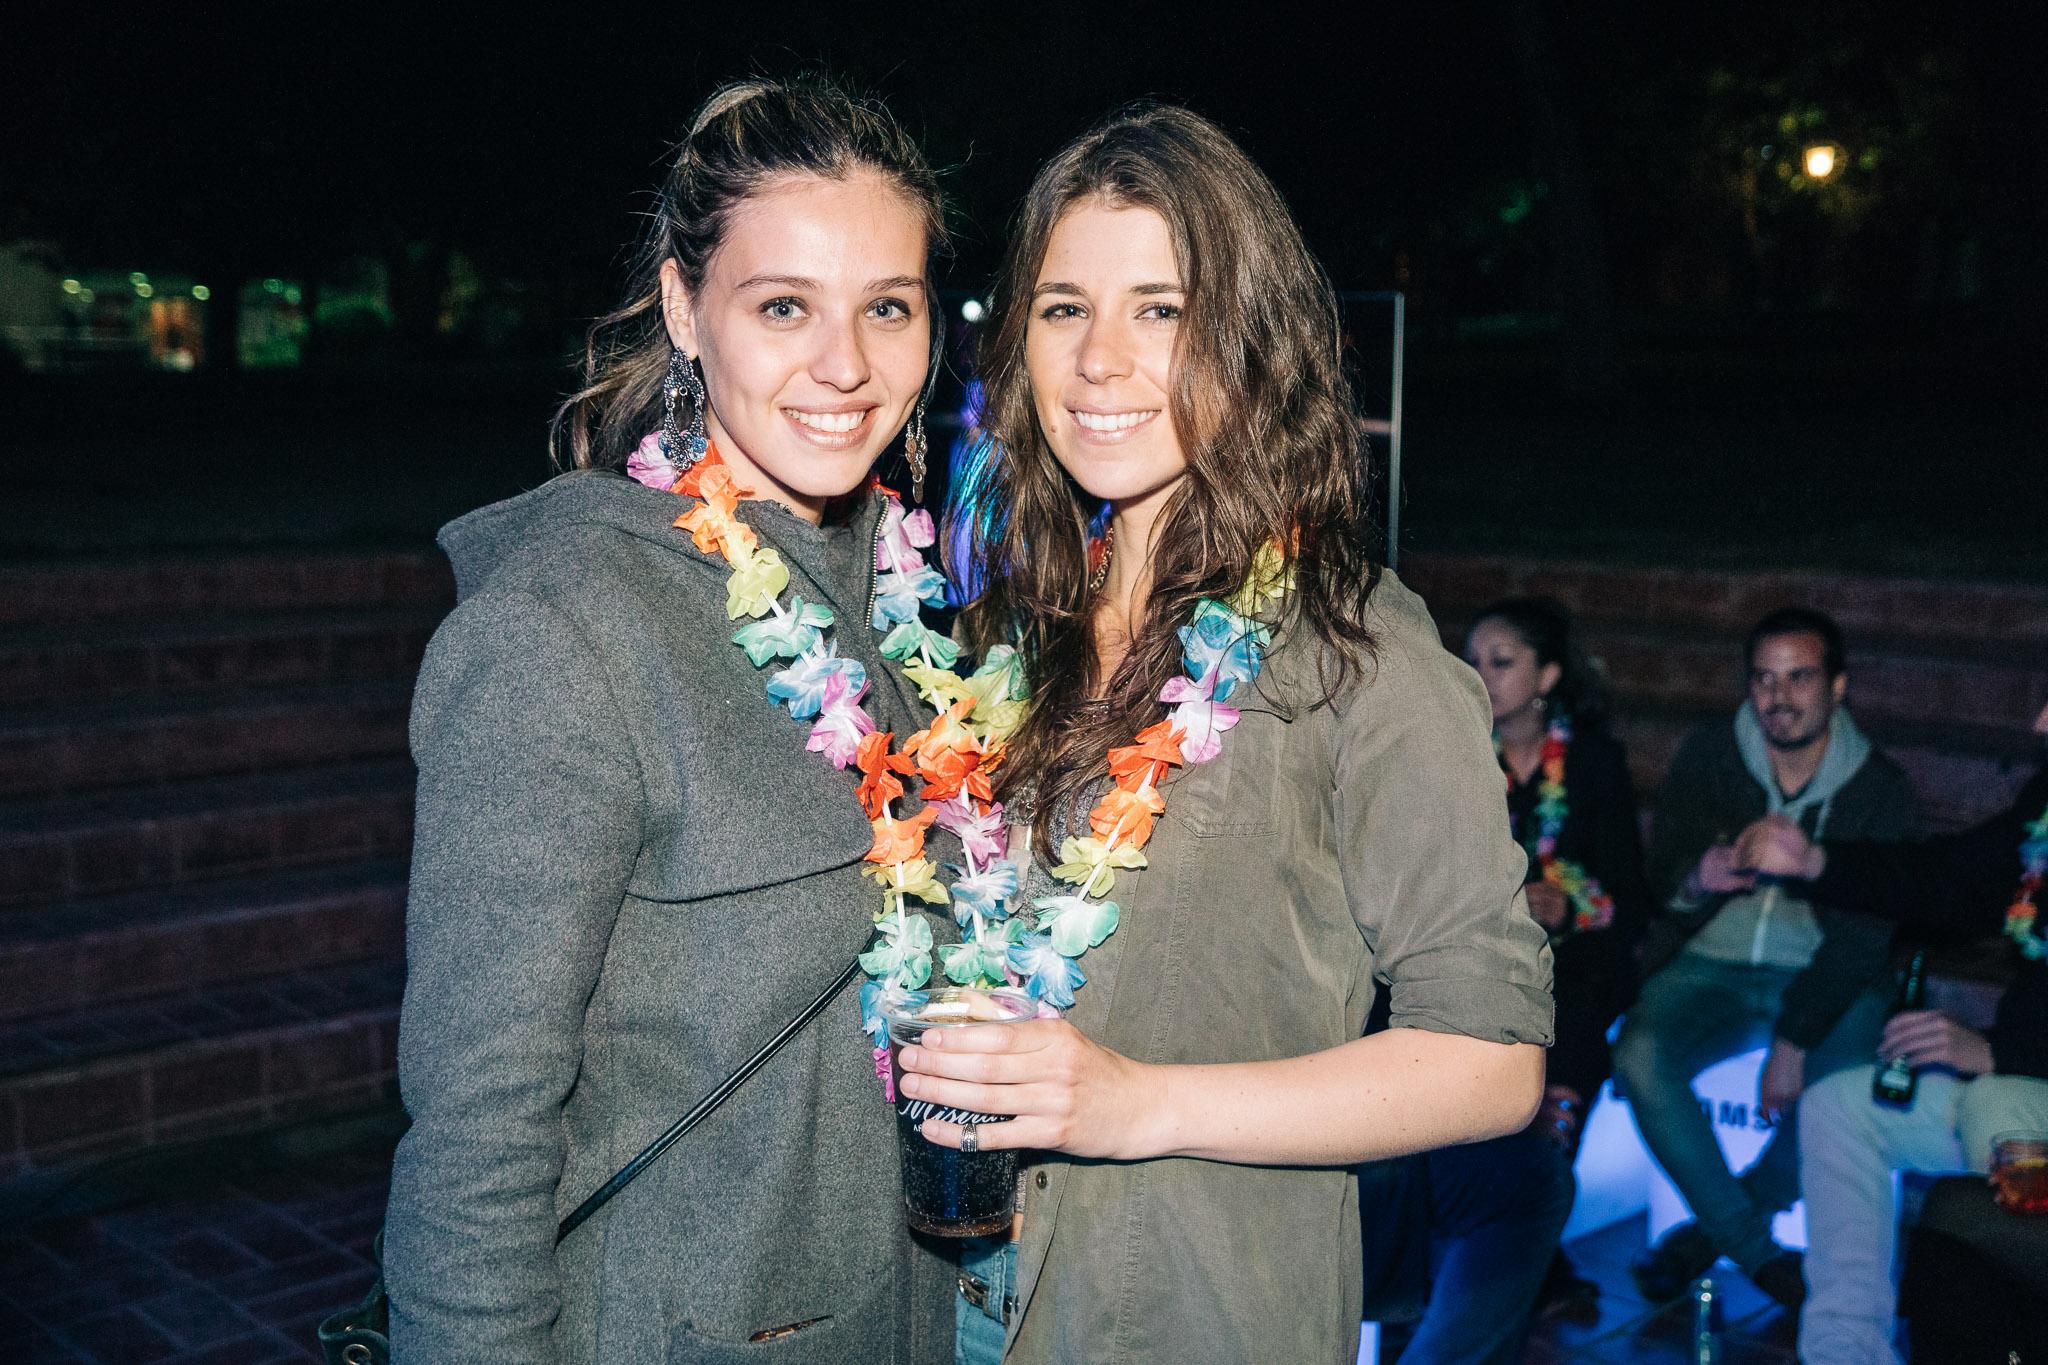 Marité Stange y Beatriz Quezada.